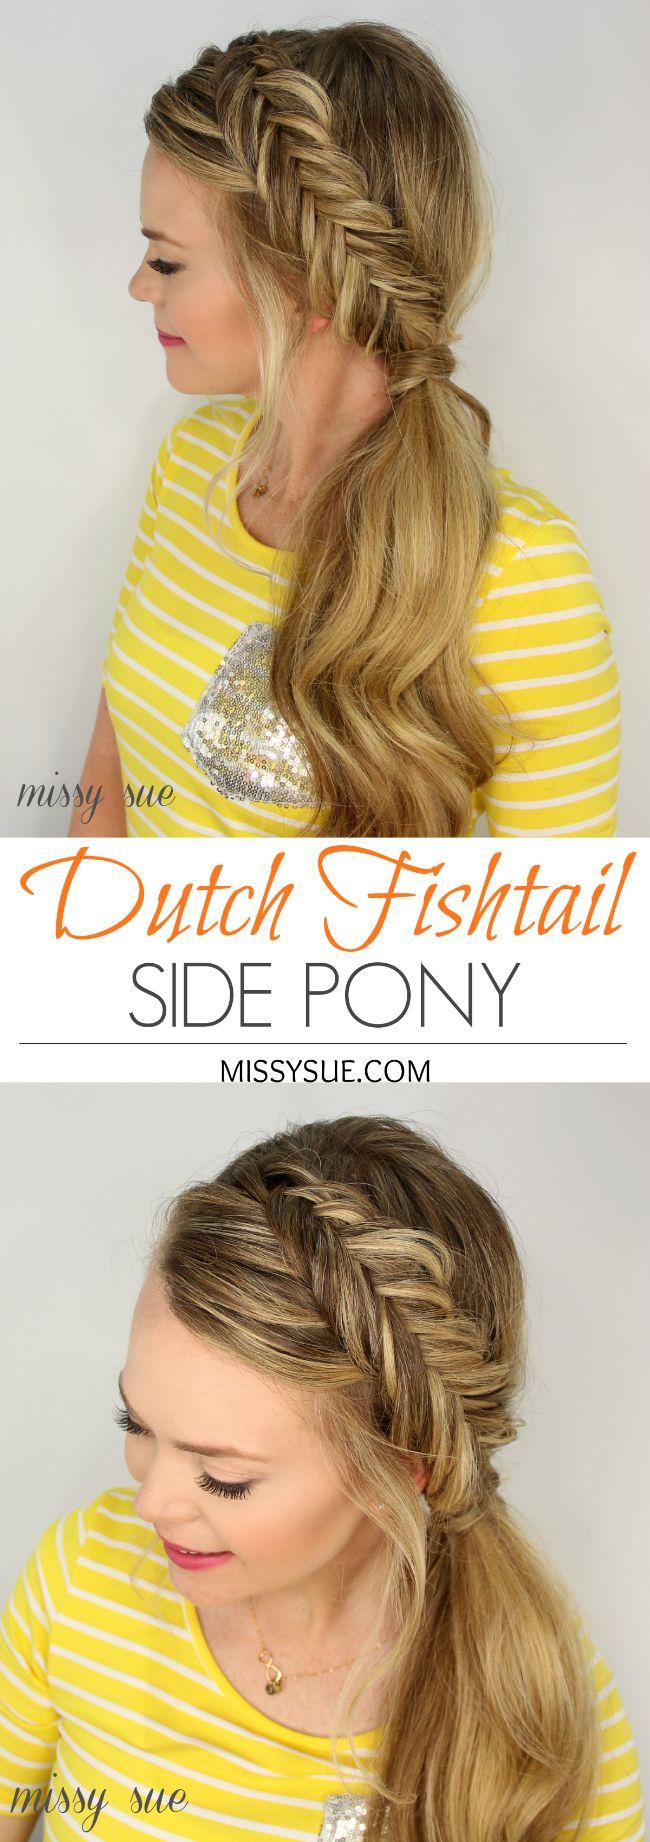 inverted-dutch-fishtail-braid-pony